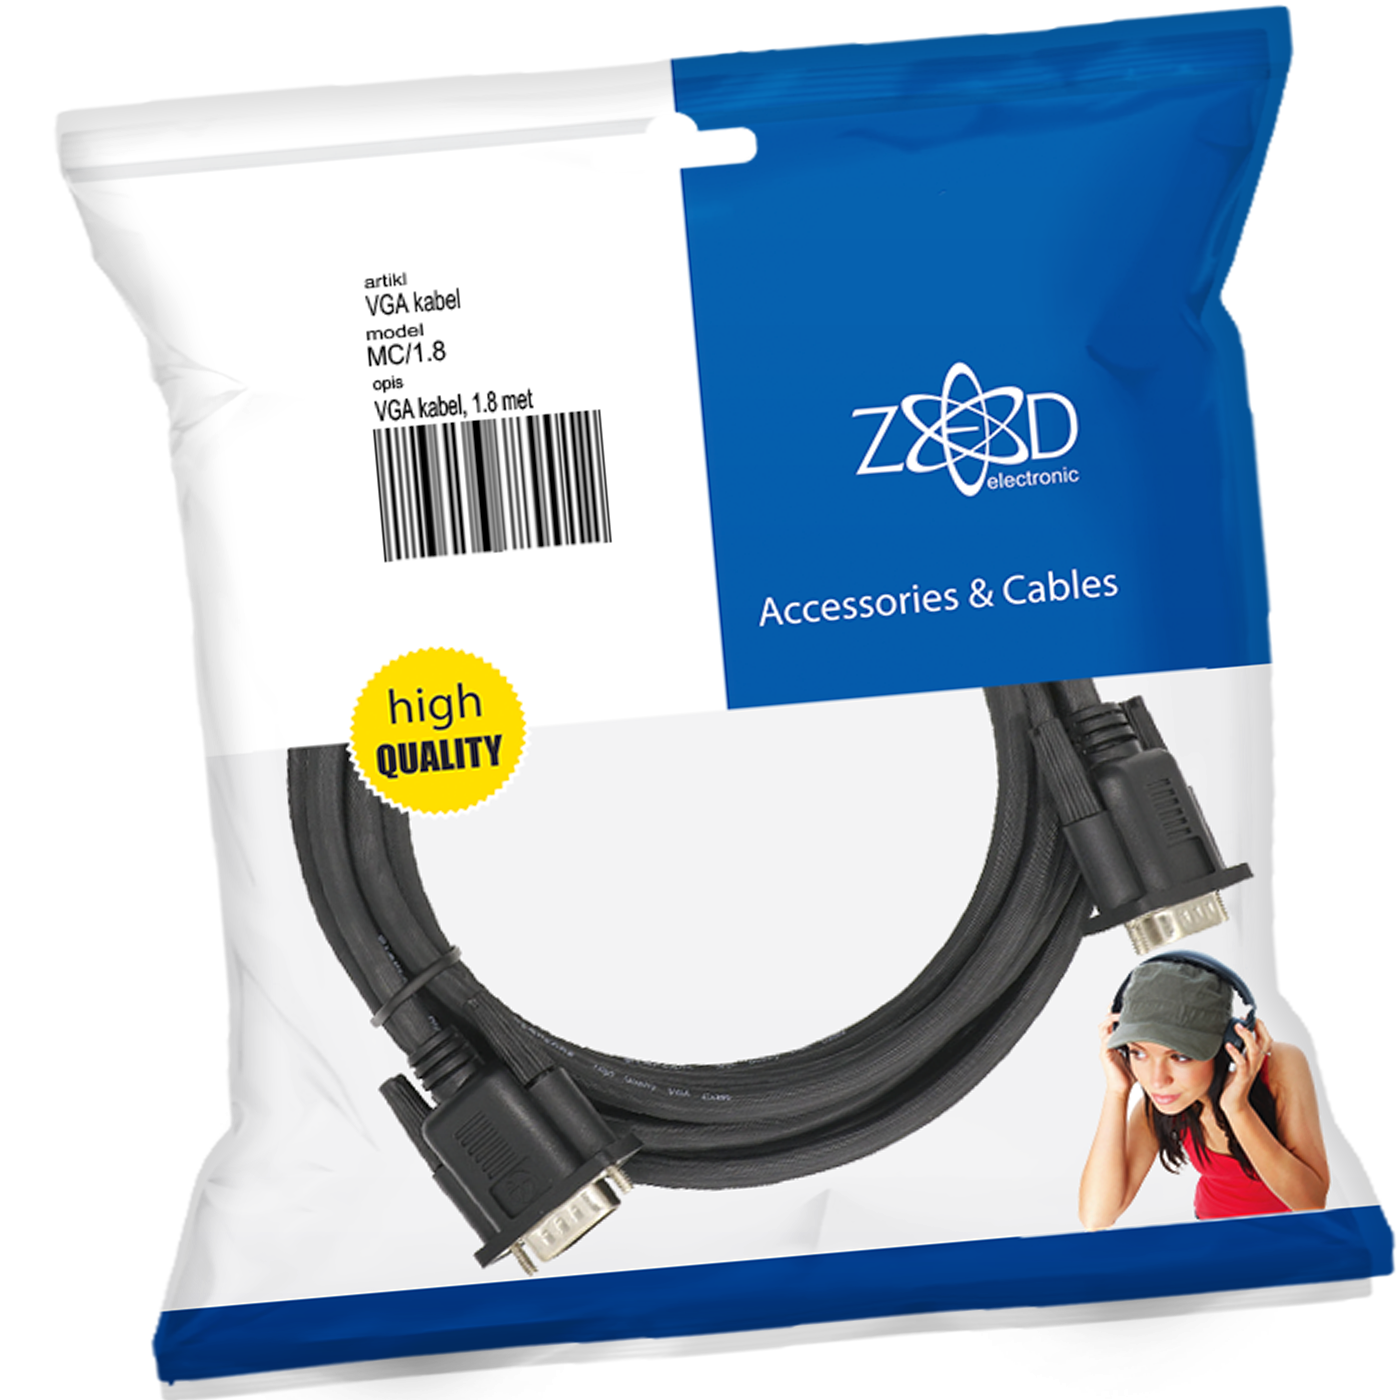 ZED electronic - MC/1,8